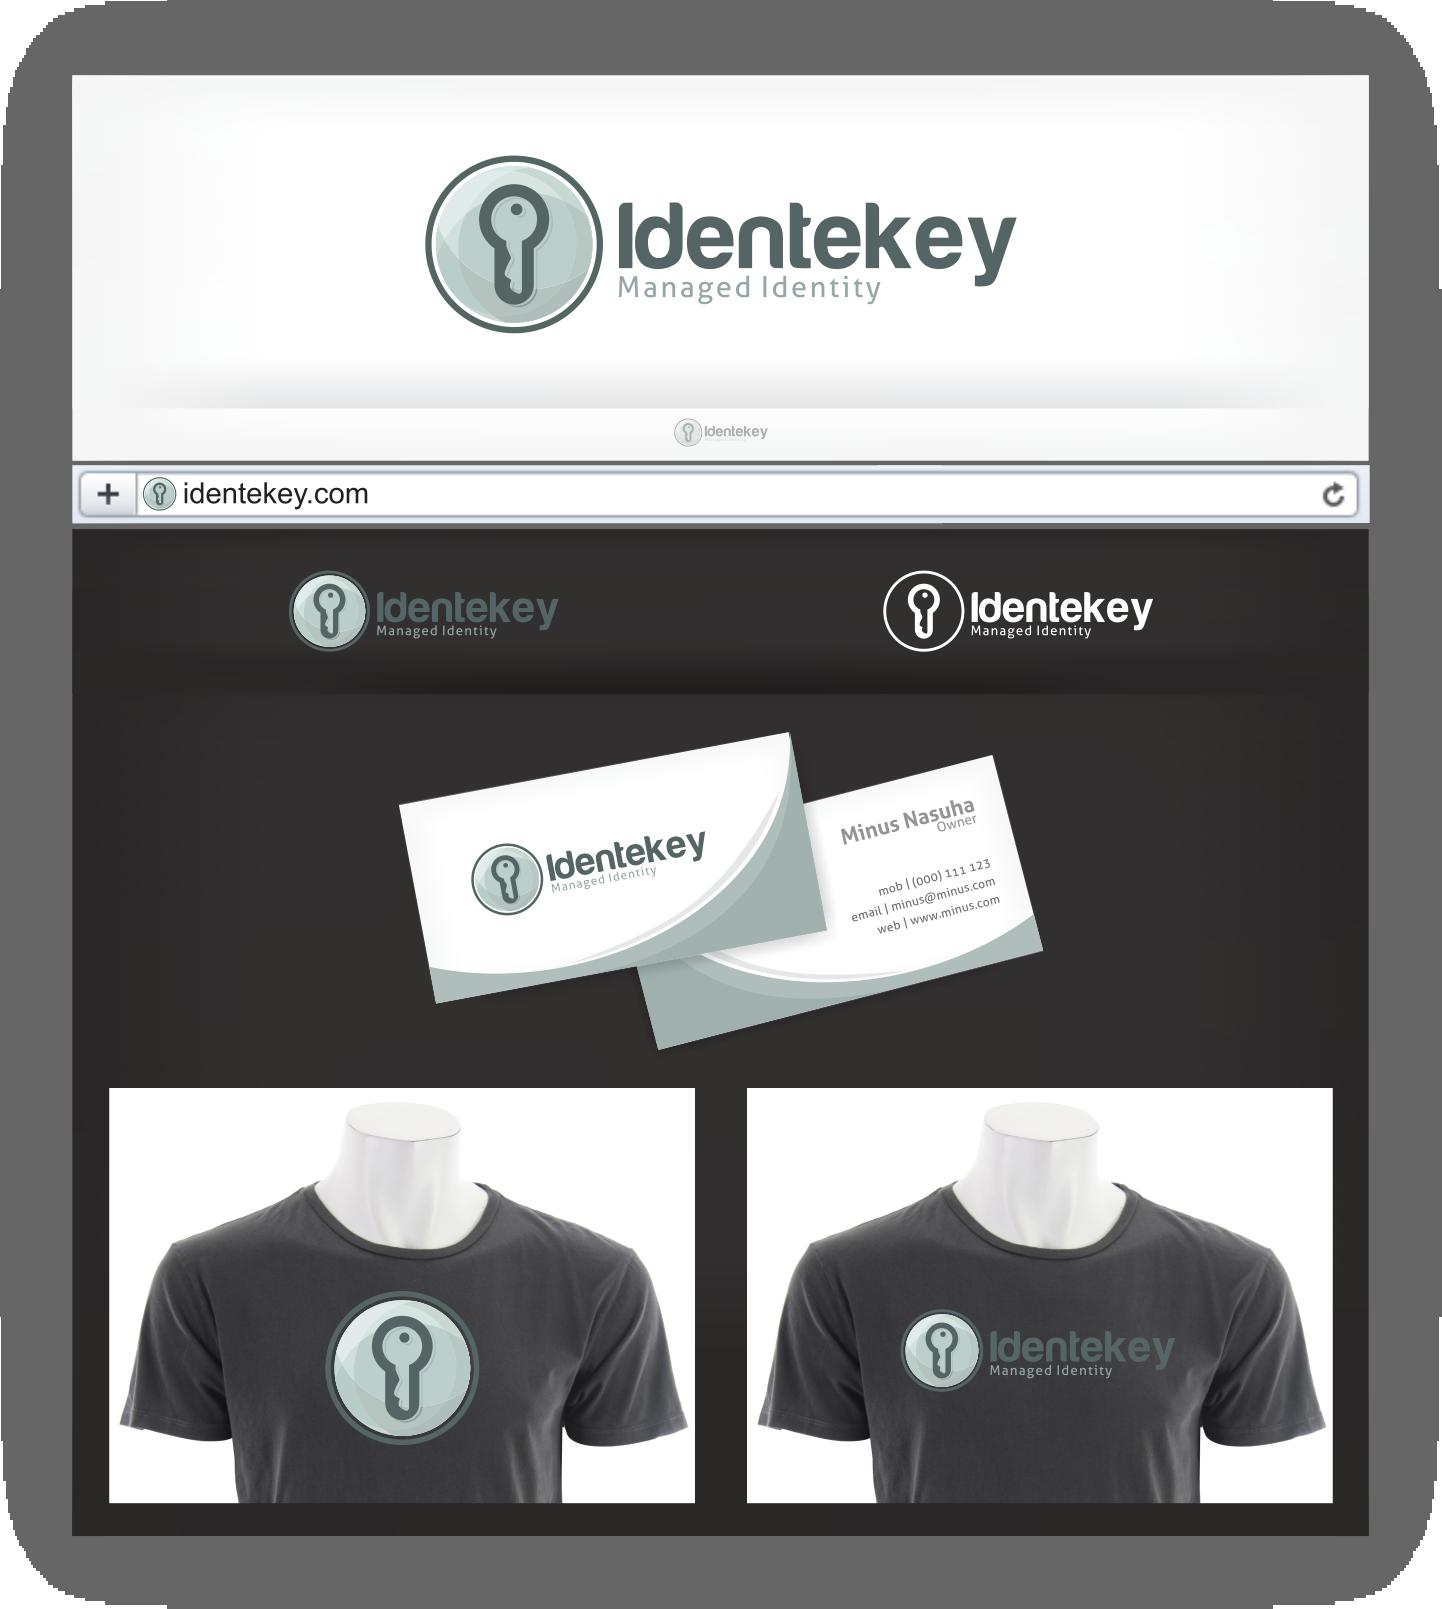 New logo wanted for Identekey